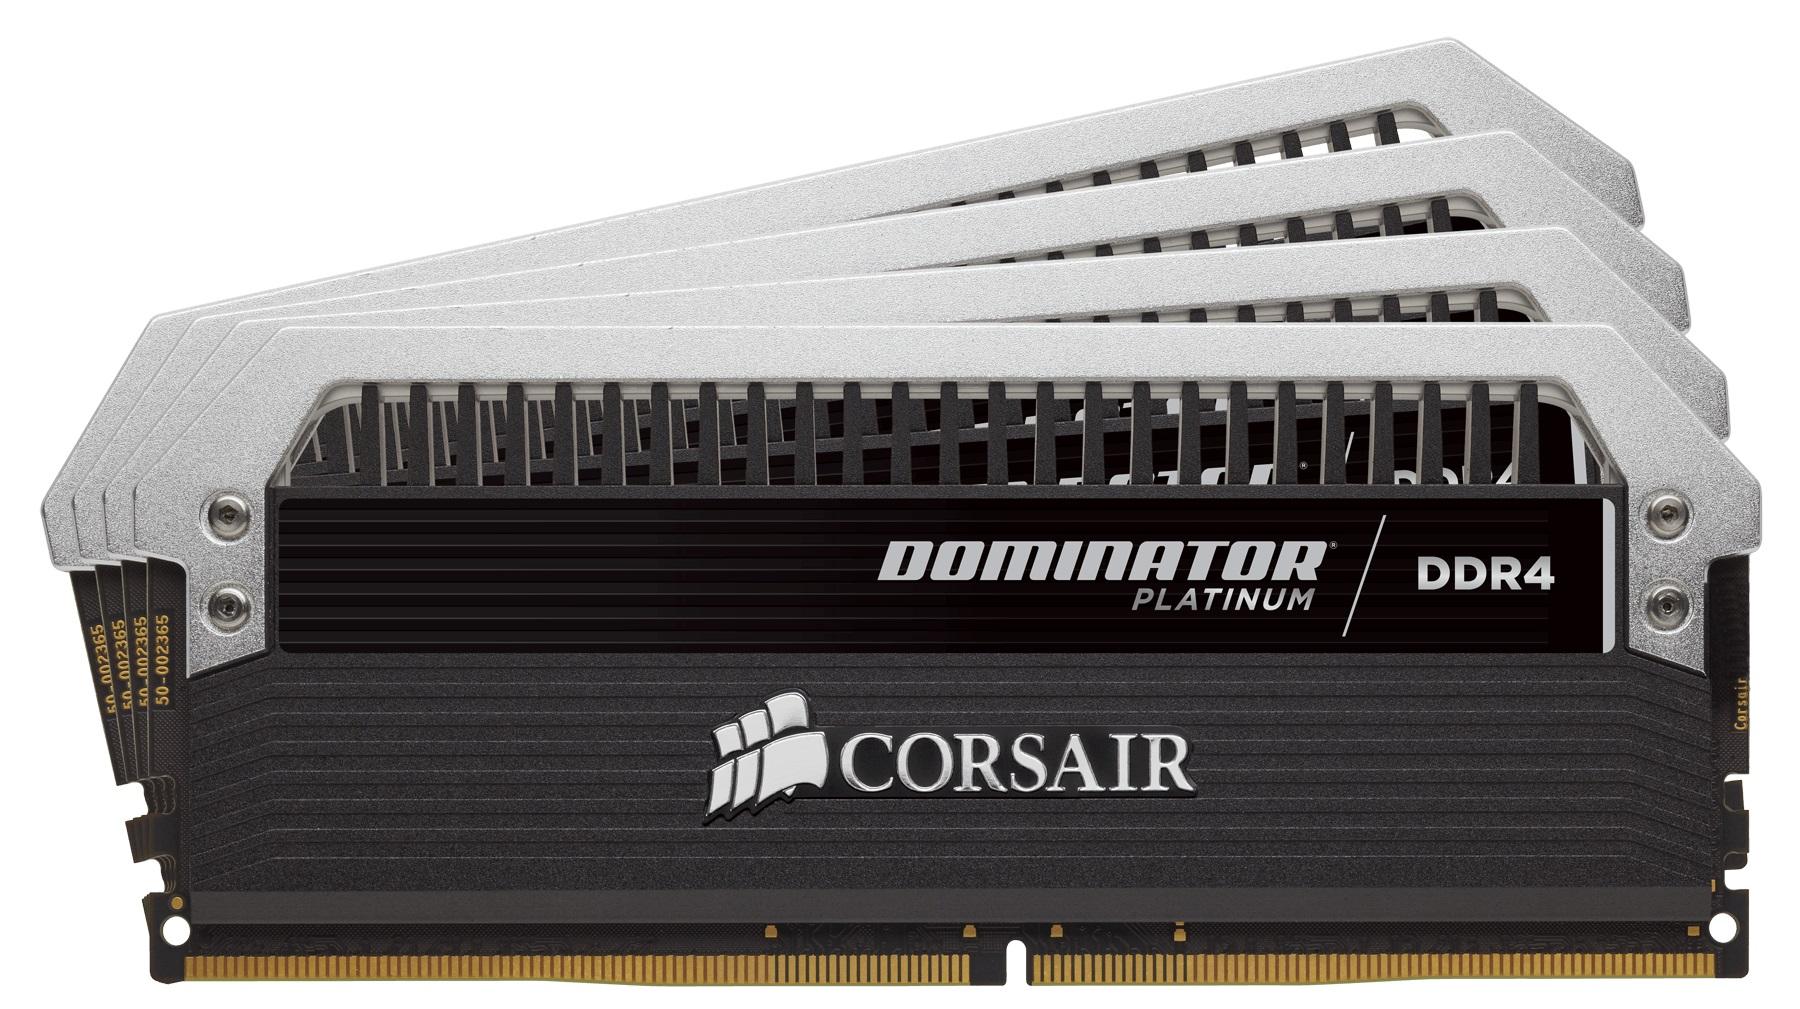 Corsair Dominator Platinum 16GB DDR4 3000MHz 4x4GB